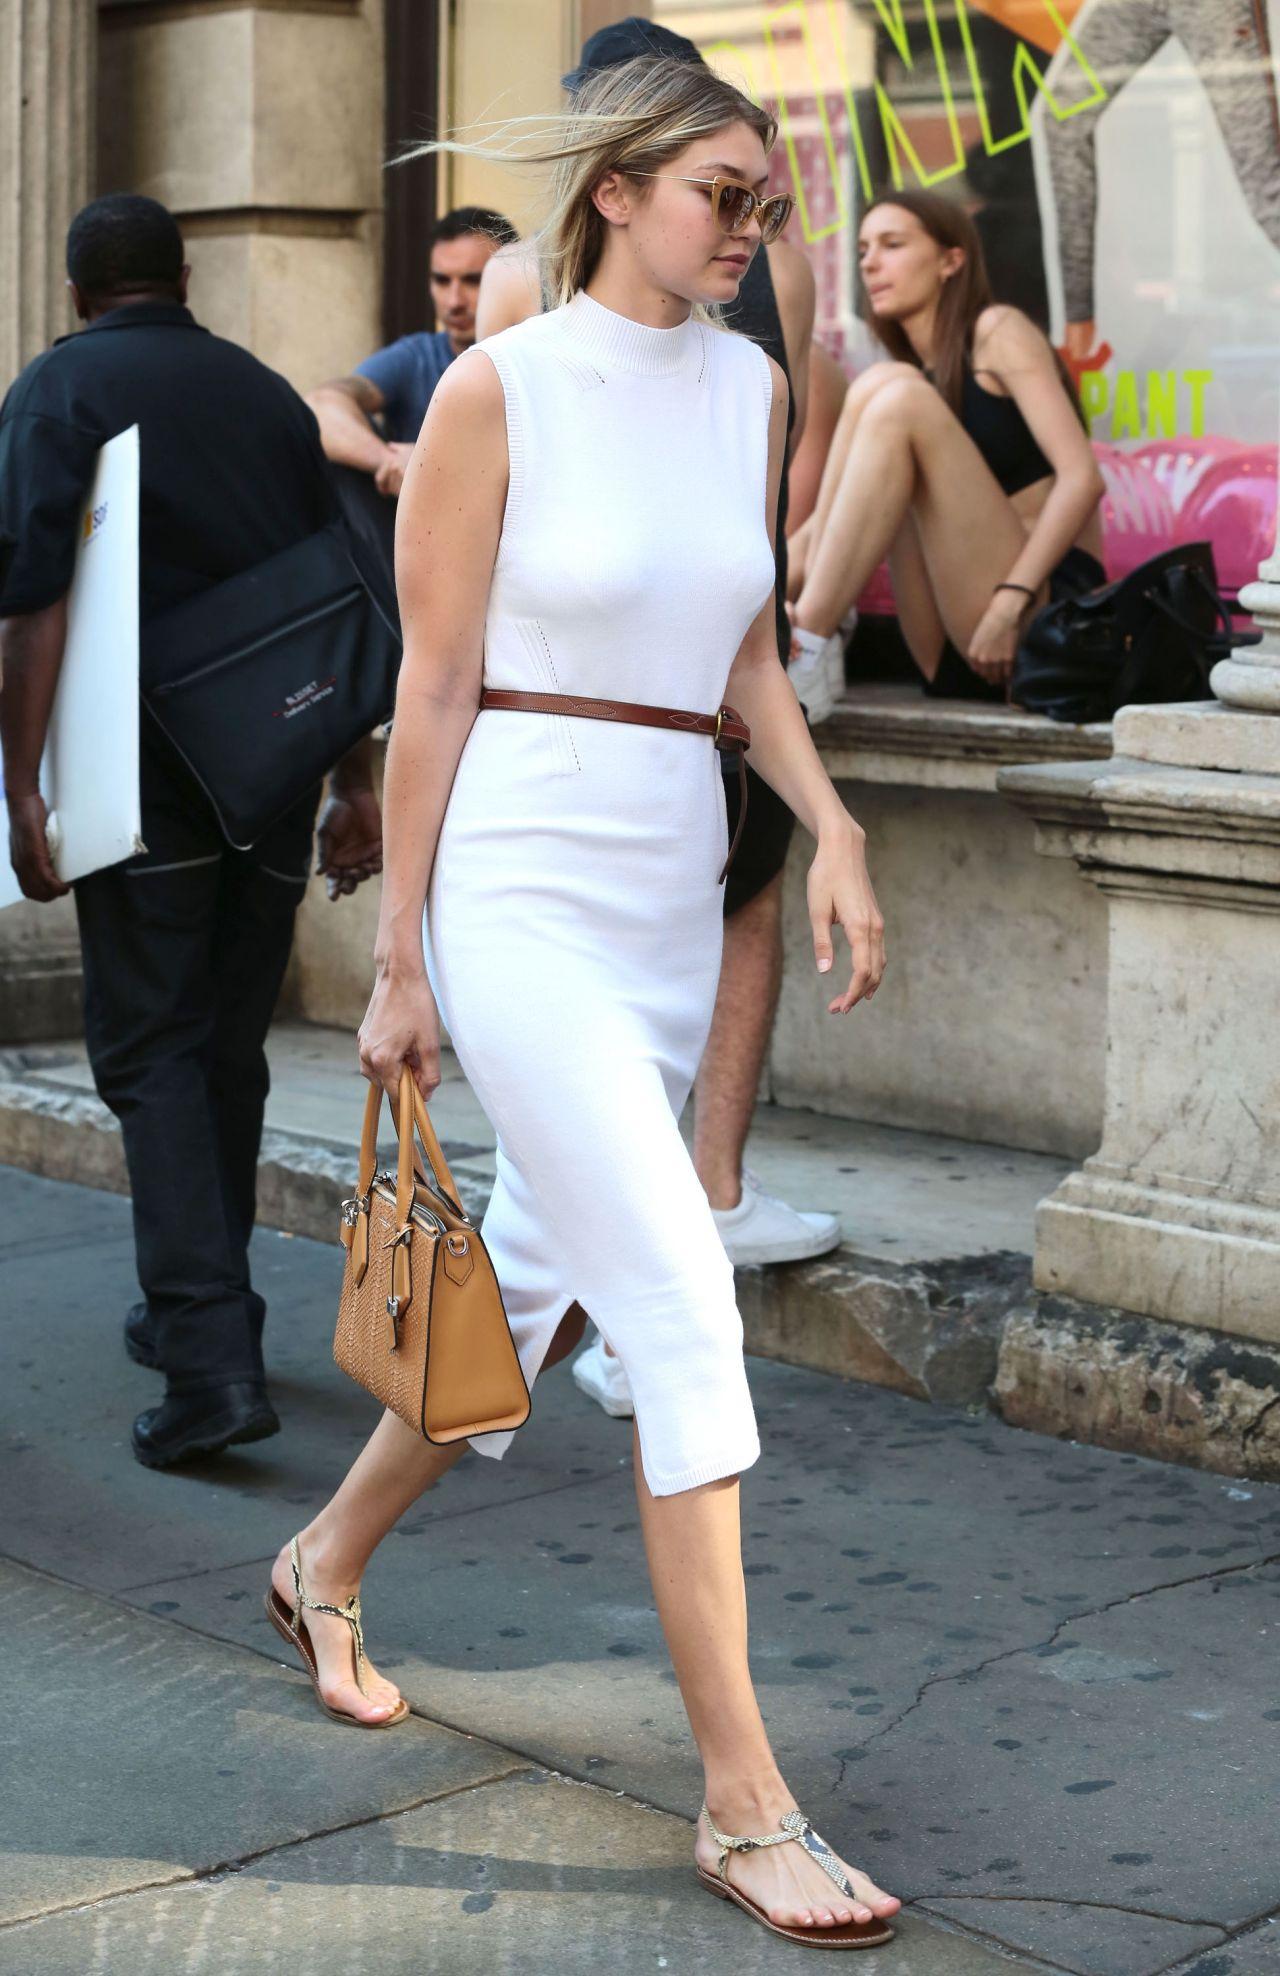 Gigi Hadid Street Fashion Out In New York City July 2015